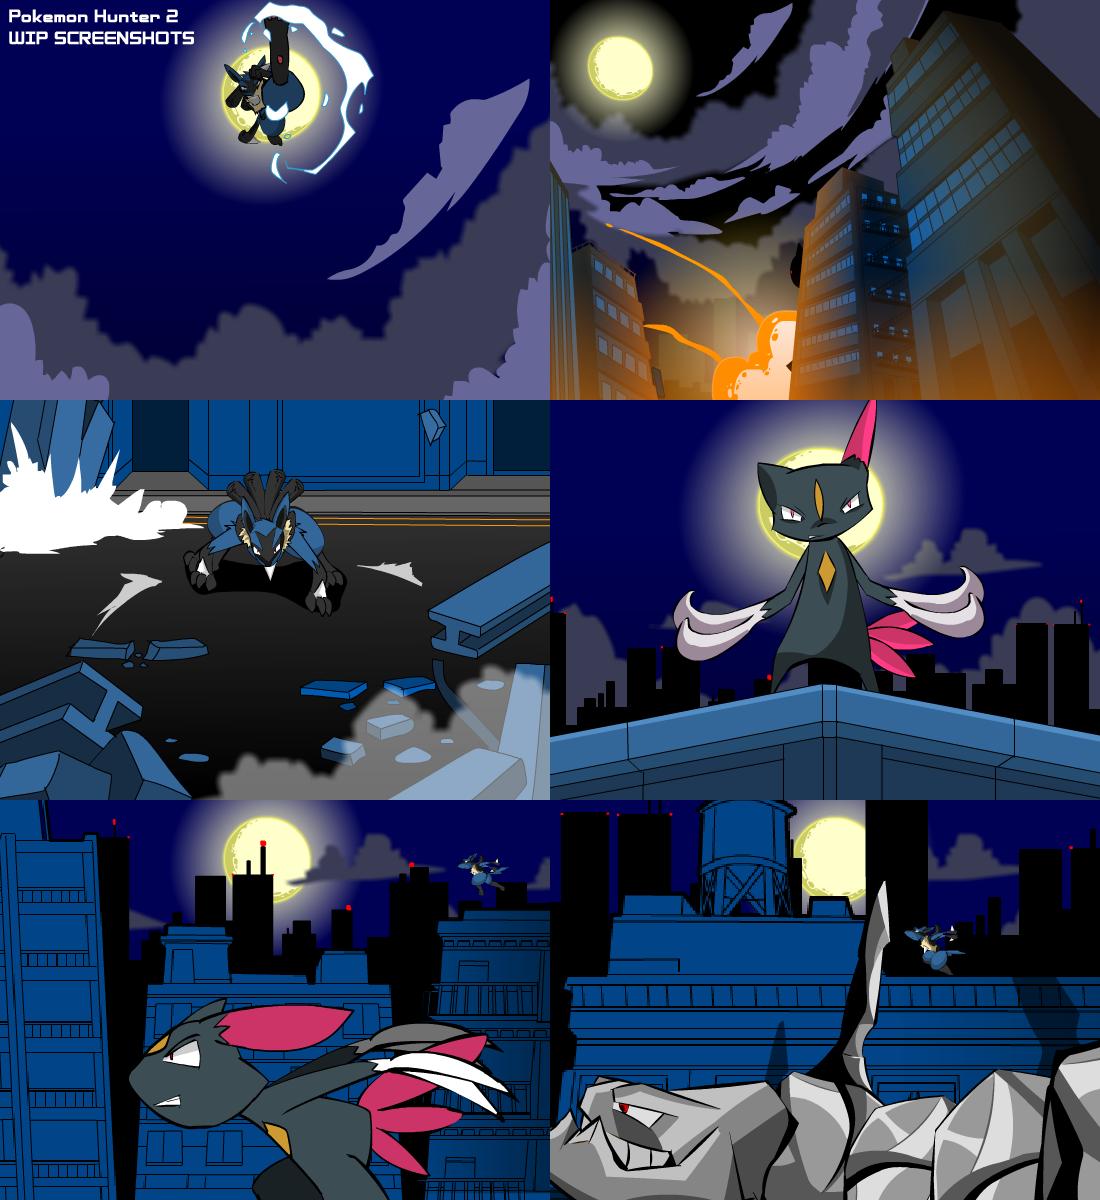 pokemon hunter wip screencaps